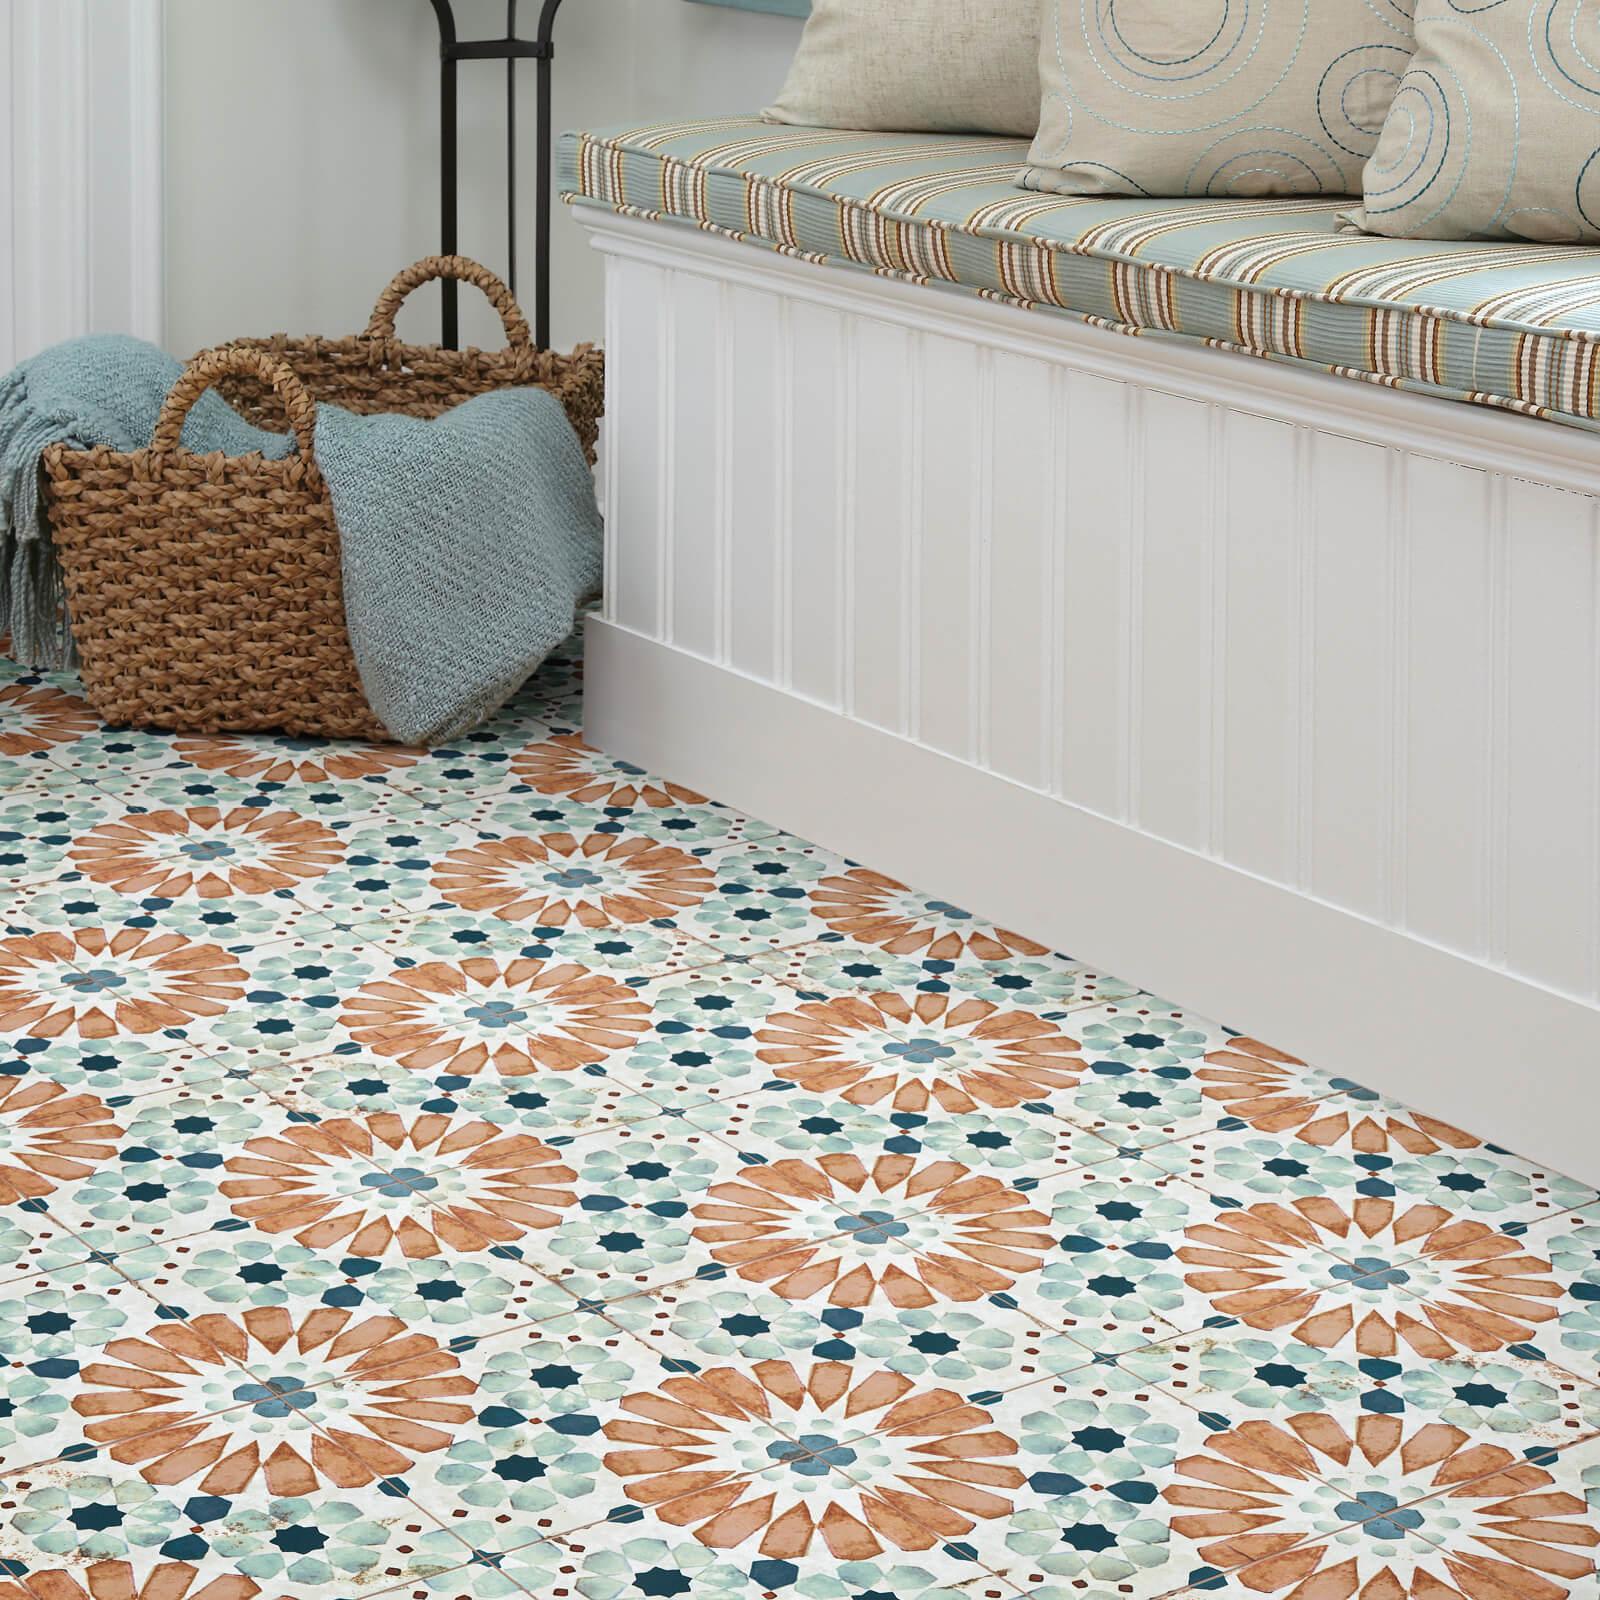 Islander tiles | Broadway Carpets, Inc